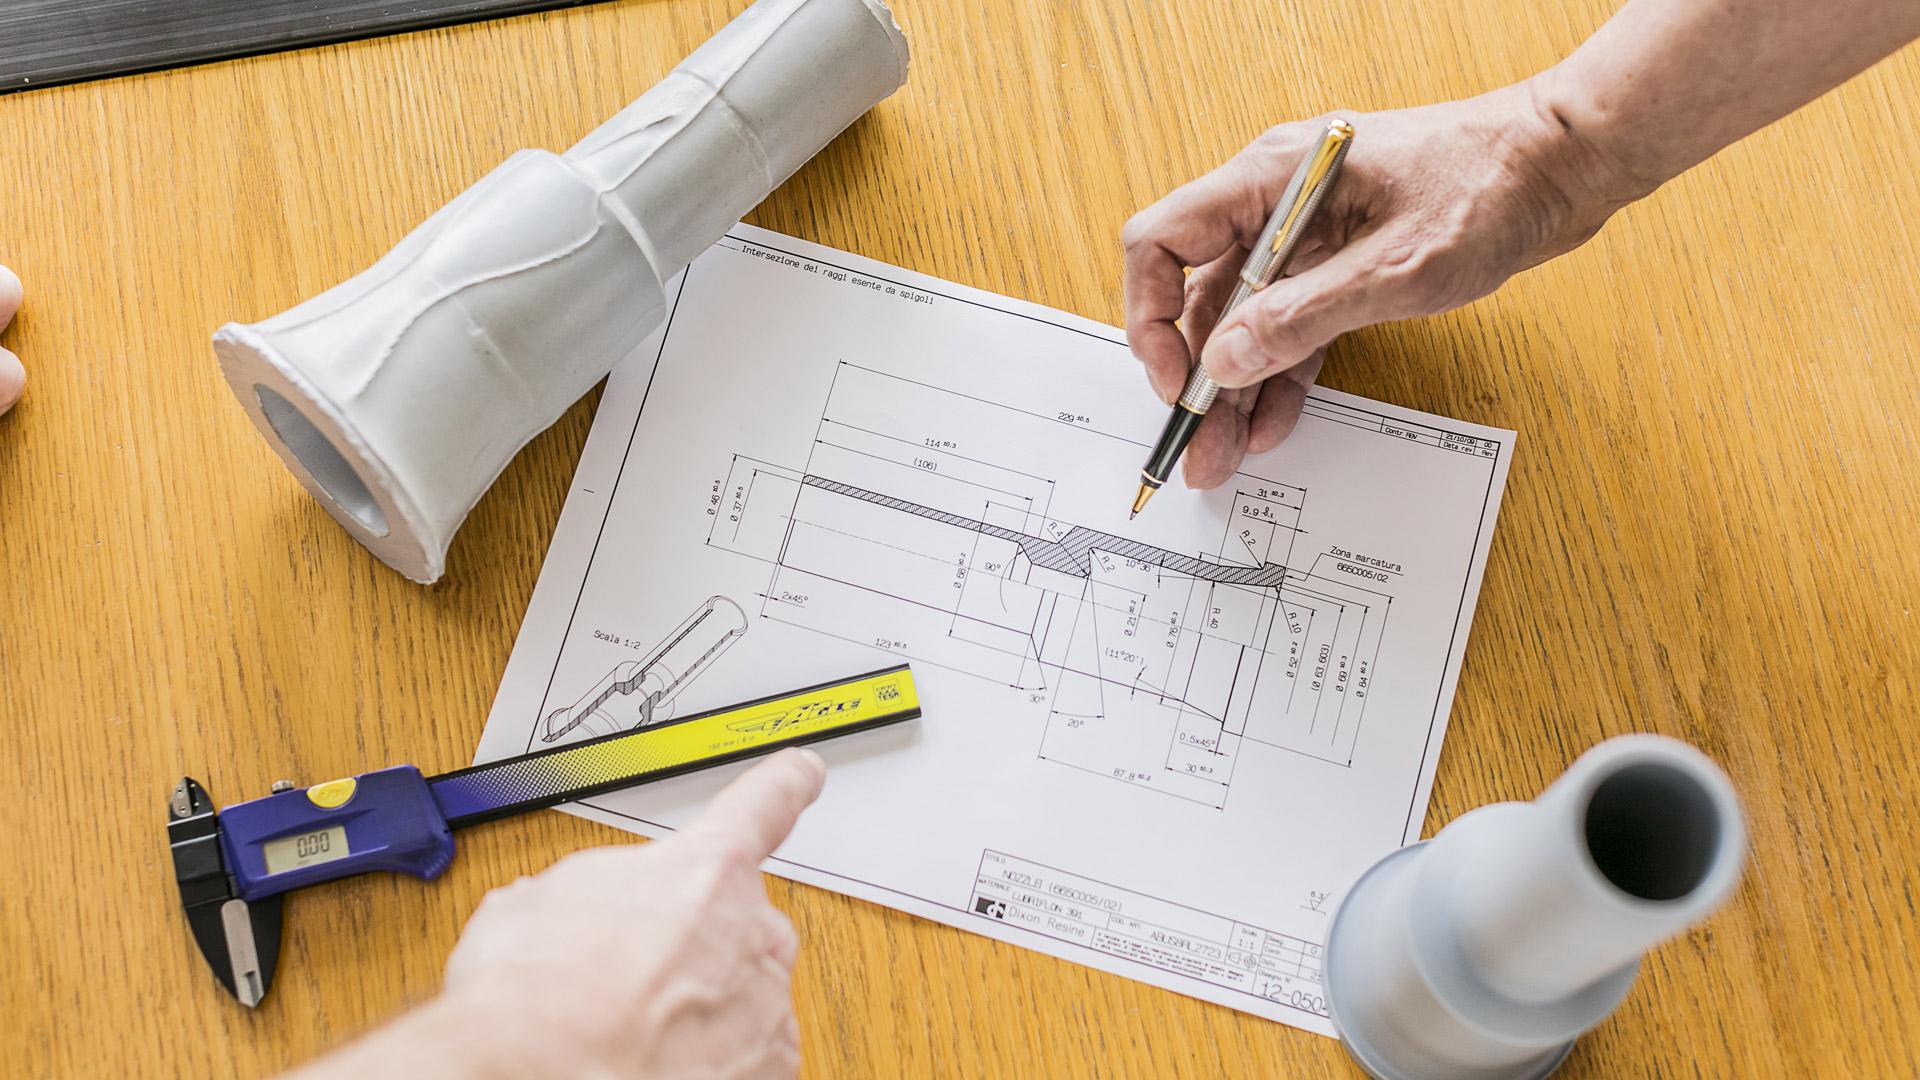 Hd Design Resine.Dixon Resine S P A Since 1961 Specialist In Converting